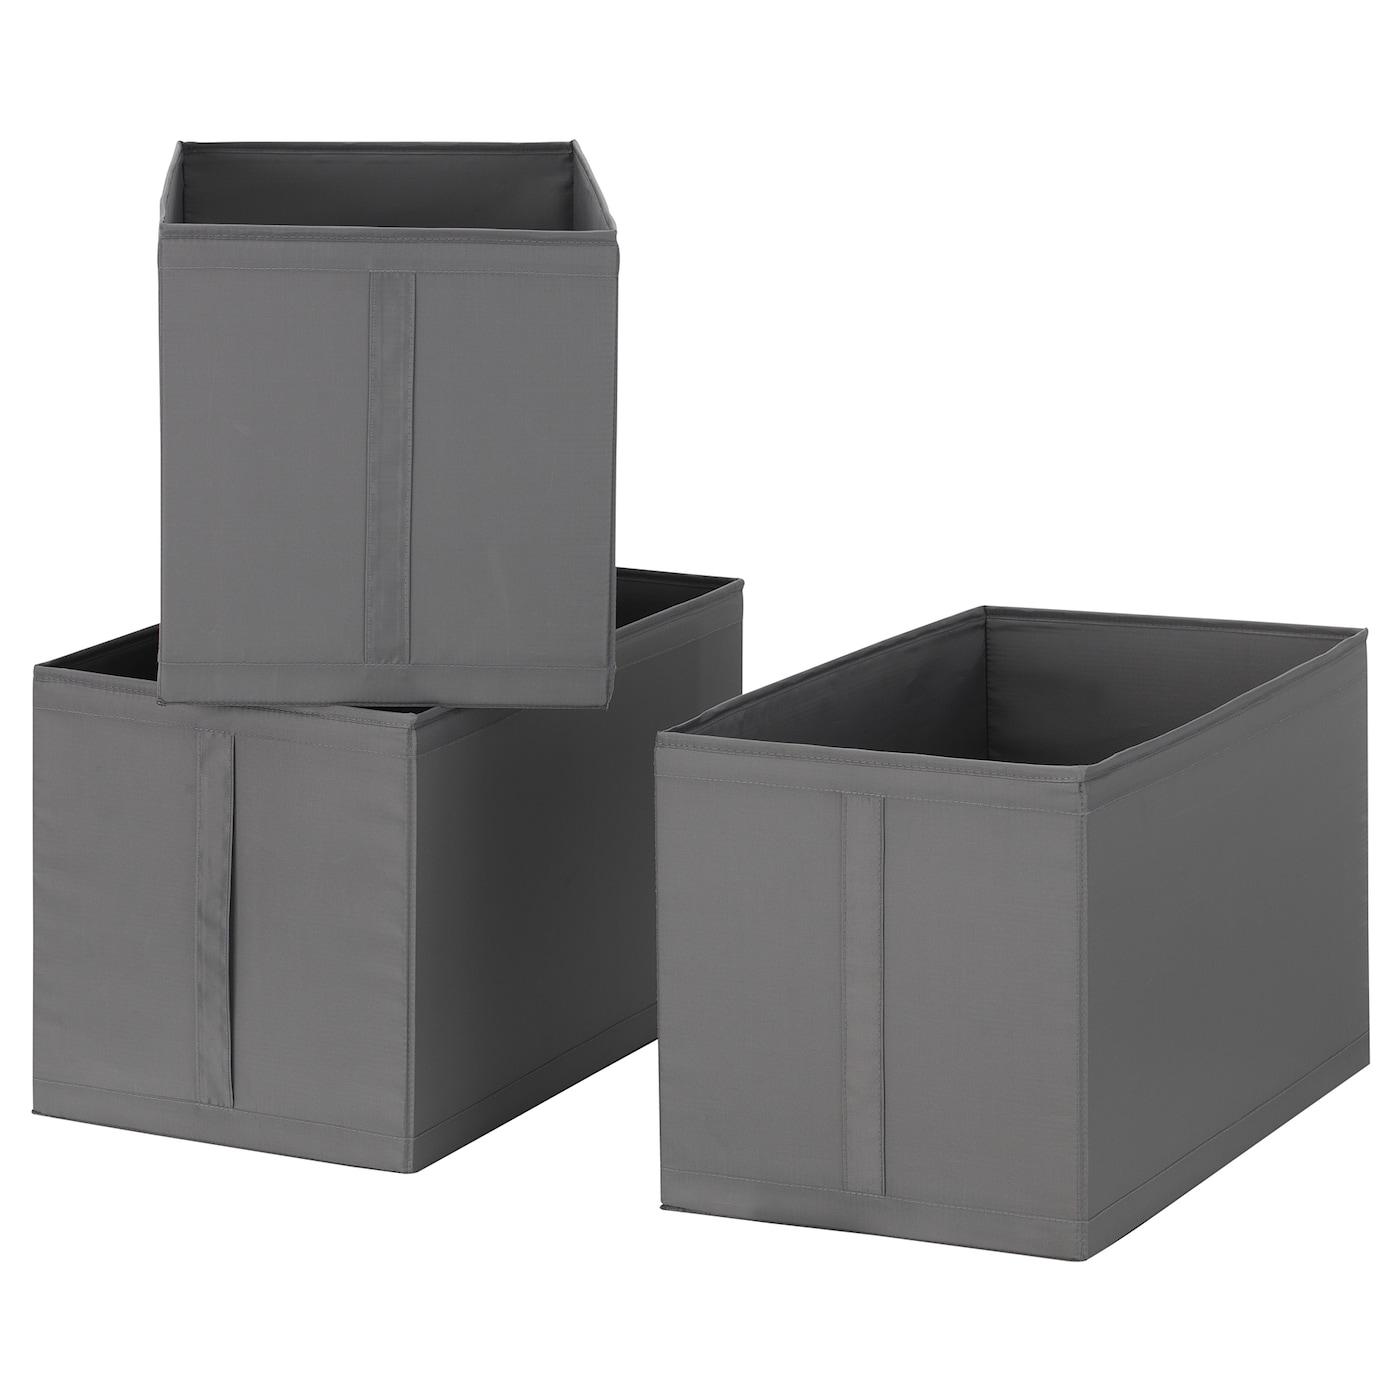 skubb box dark grey 31x55x33 cm ikea. Black Bedroom Furniture Sets. Home Design Ideas